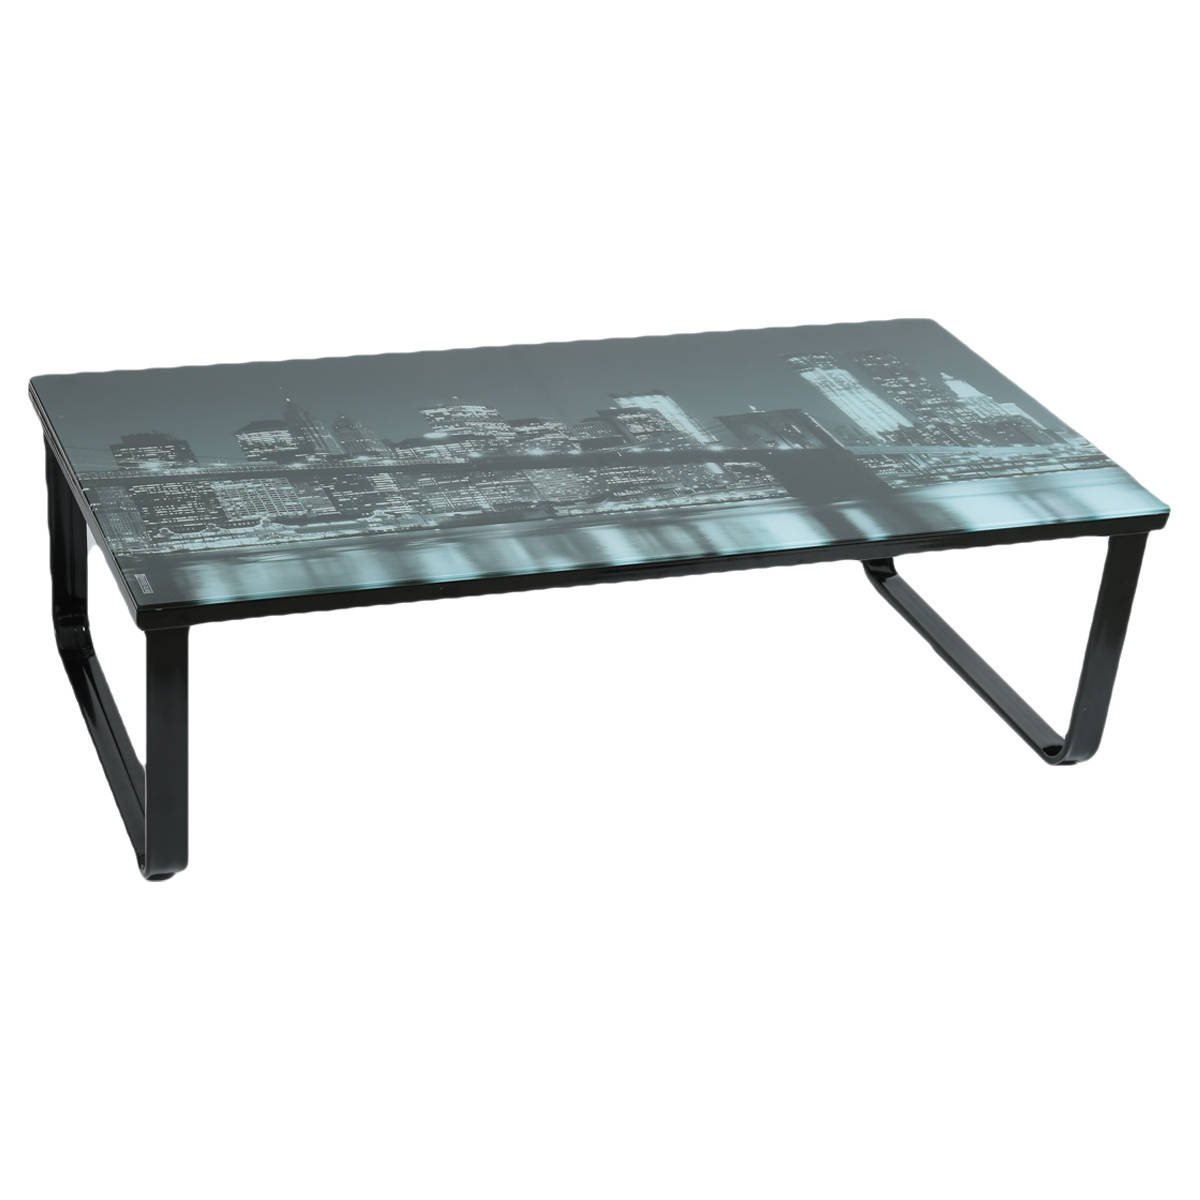 carrelage blanc et turquoise maison et mobilier. Black Bedroom Furniture Sets. Home Design Ideas